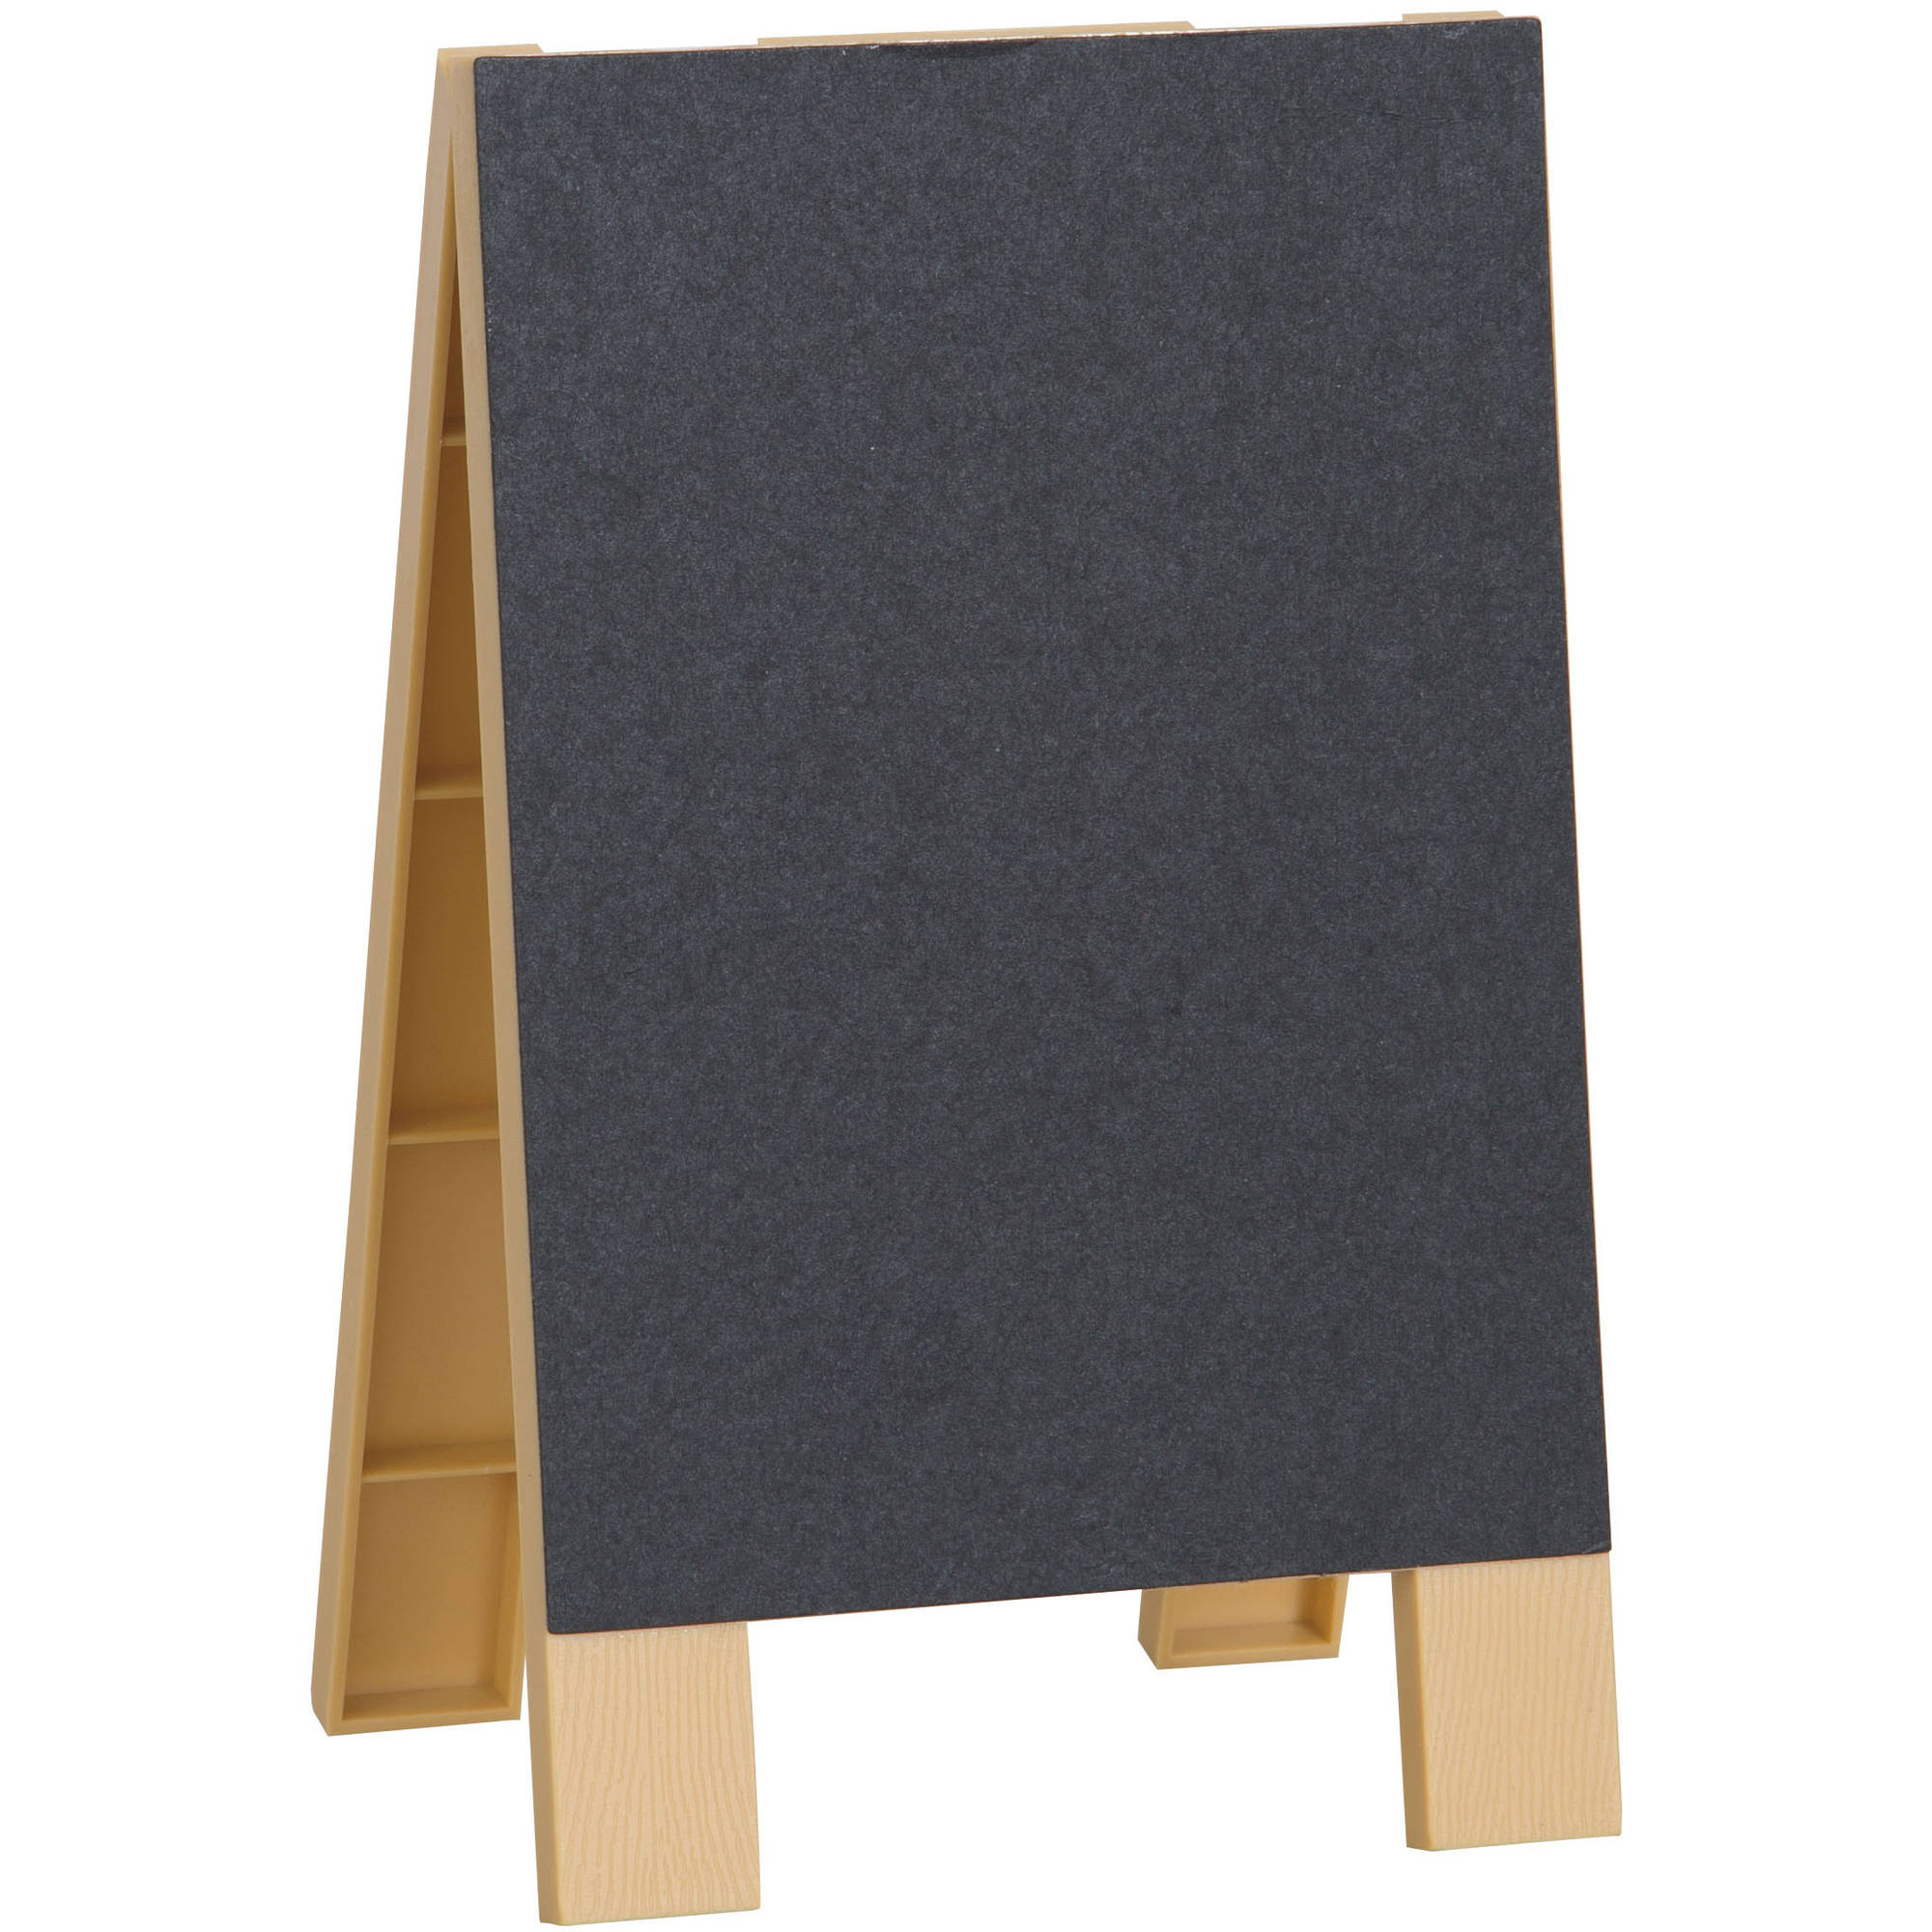 Mini Chalkboard Easel Sign, 6.5in